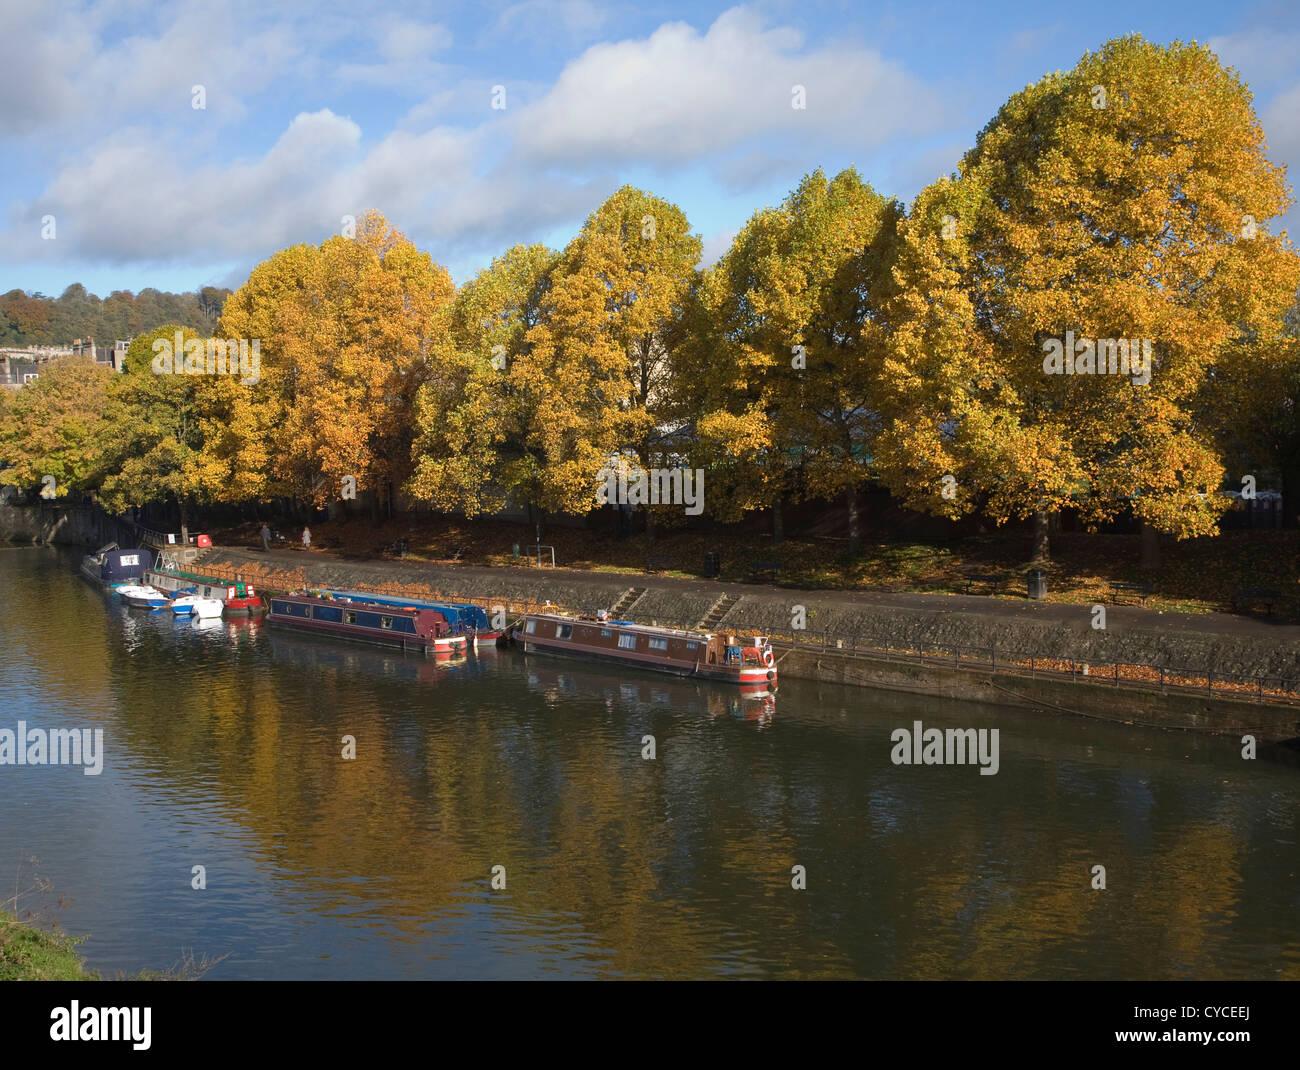 Narrow boats River Avon, Bath, Somerset, England - Stock Image